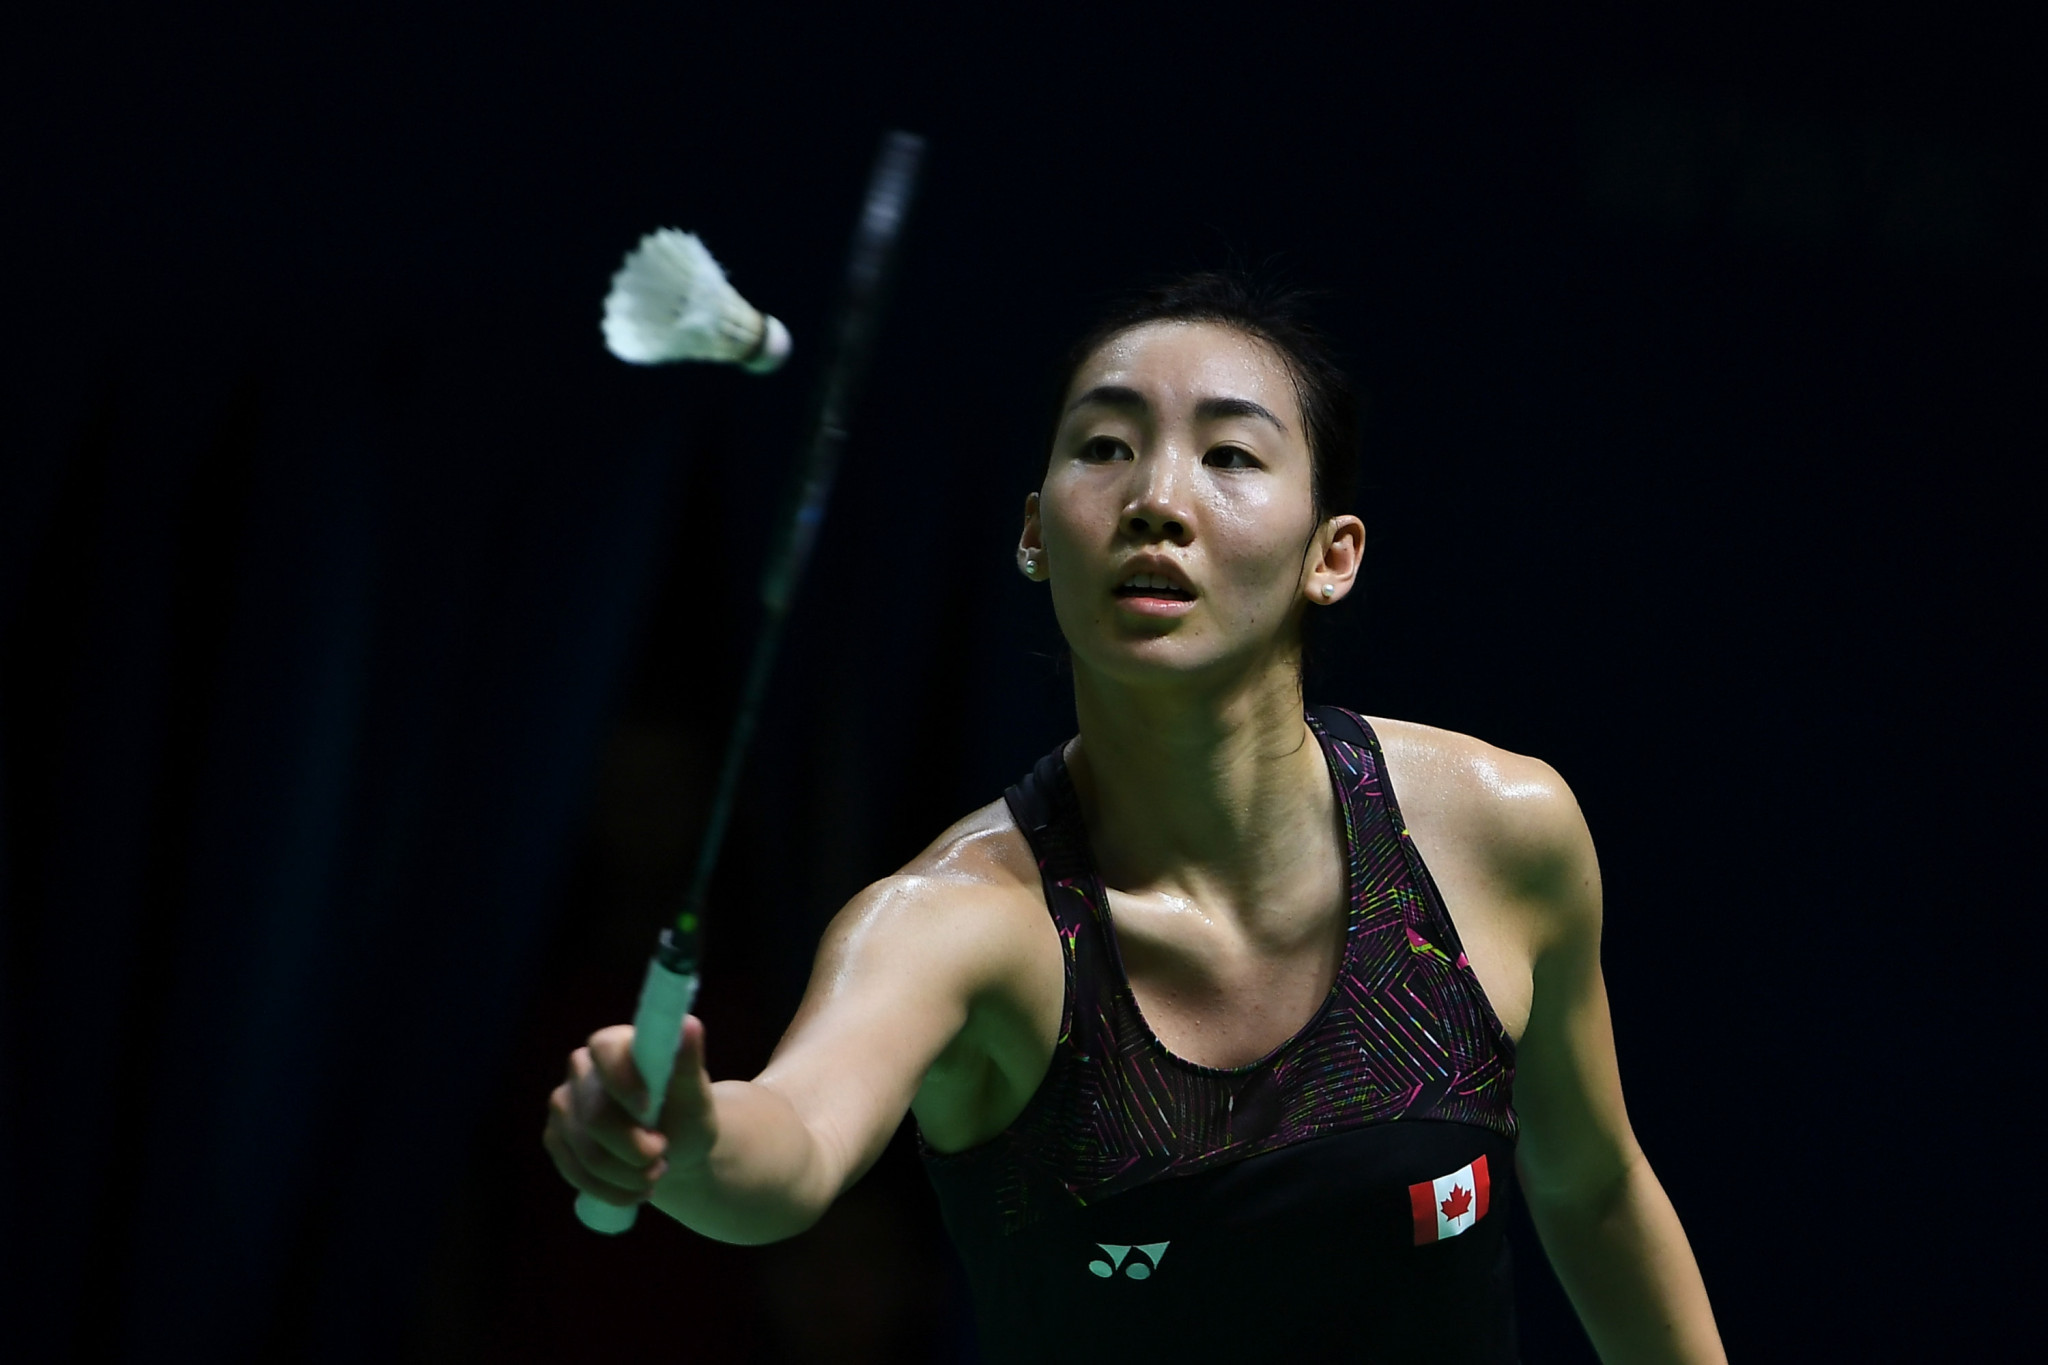 Li and Tam set up all-Canadian women's singles final at Pan American Individual Badminton Championships